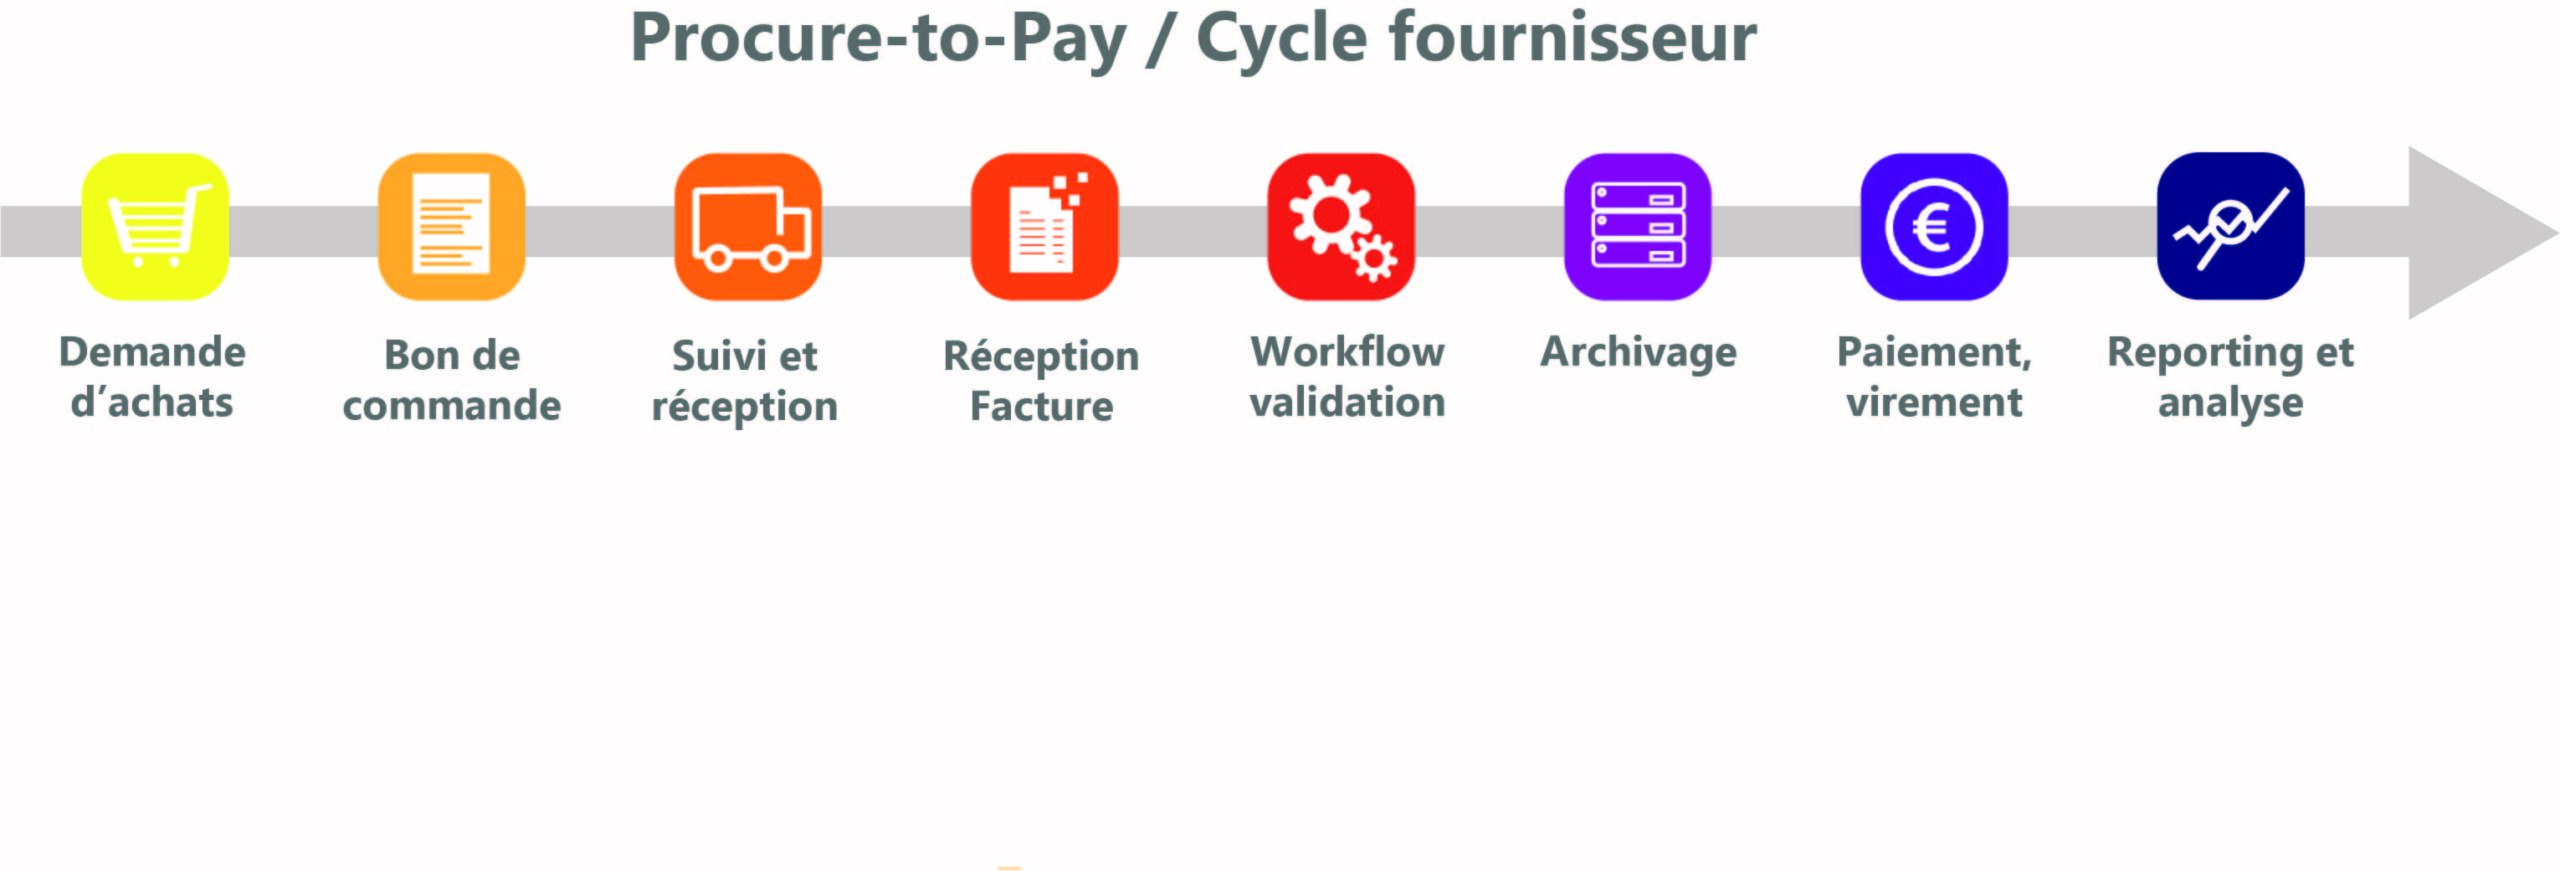 Schématisation du cycle Procure-to-Pay